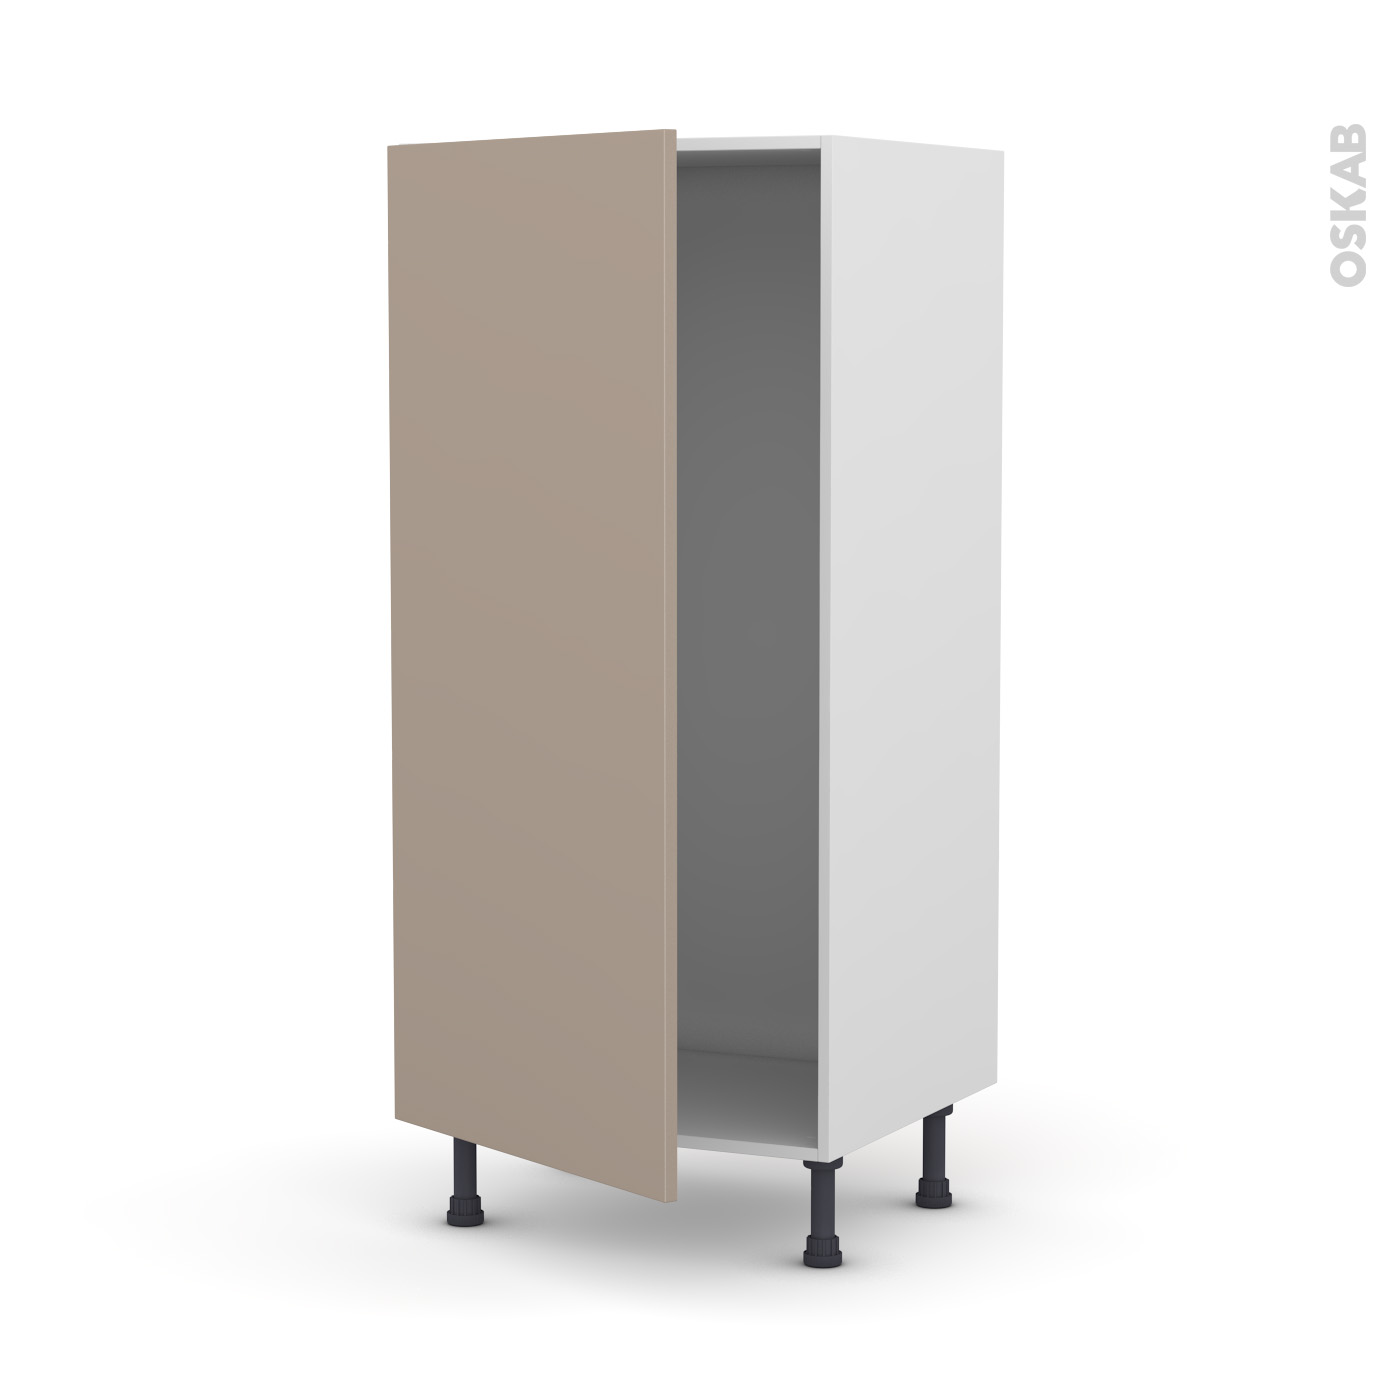 Dimension Frigo Encastrable Ikea colonne de cuisine n°27 armoire frigo encastrable ginko taupe, 1 porte, l60  x h125 x p58 cm